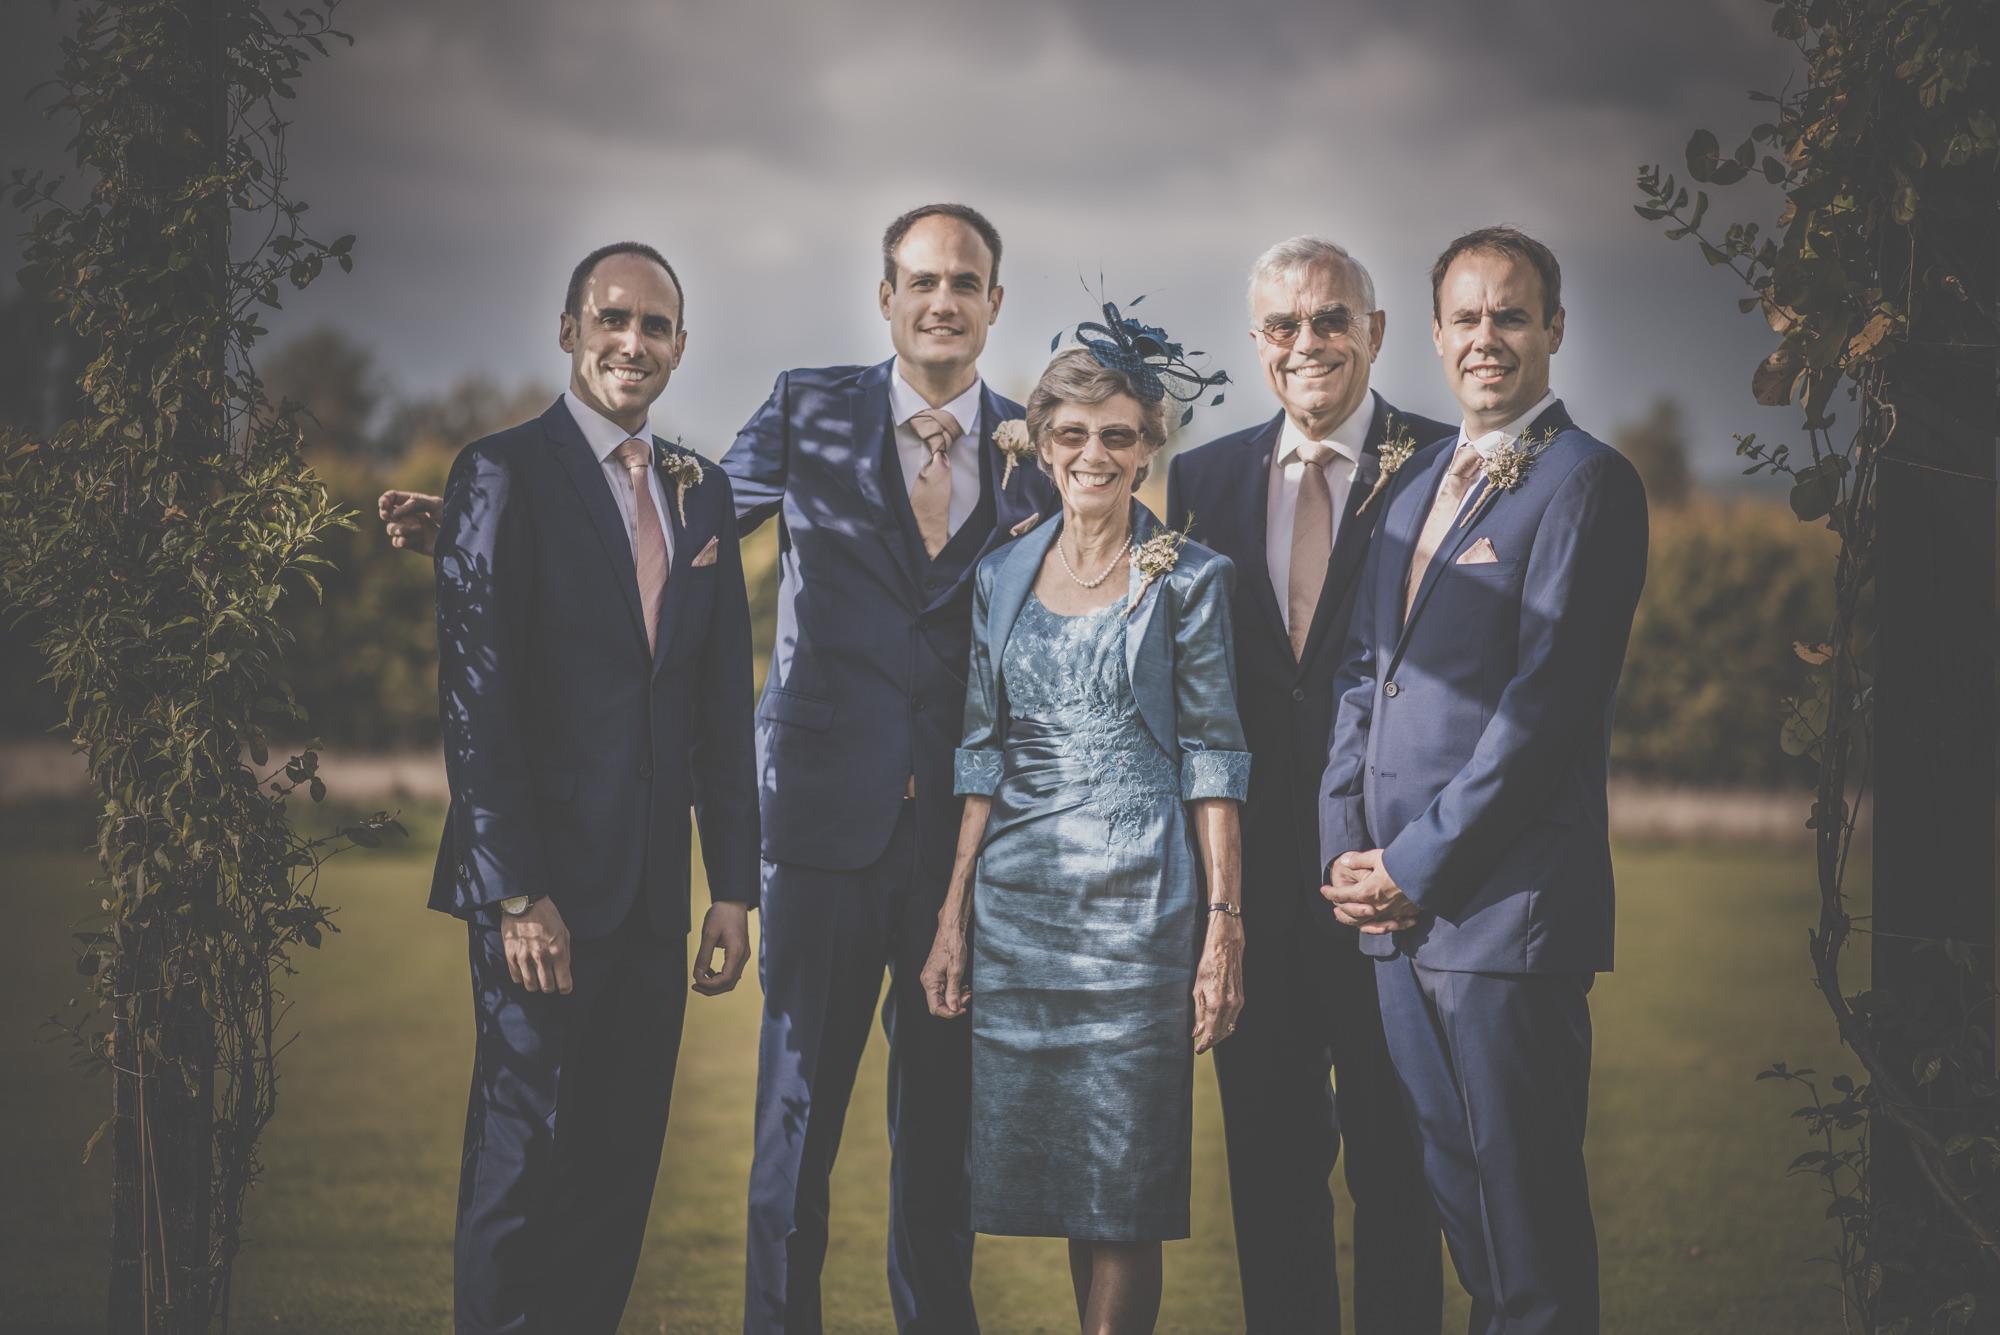 Family Groups Wedding Photography Hampshire